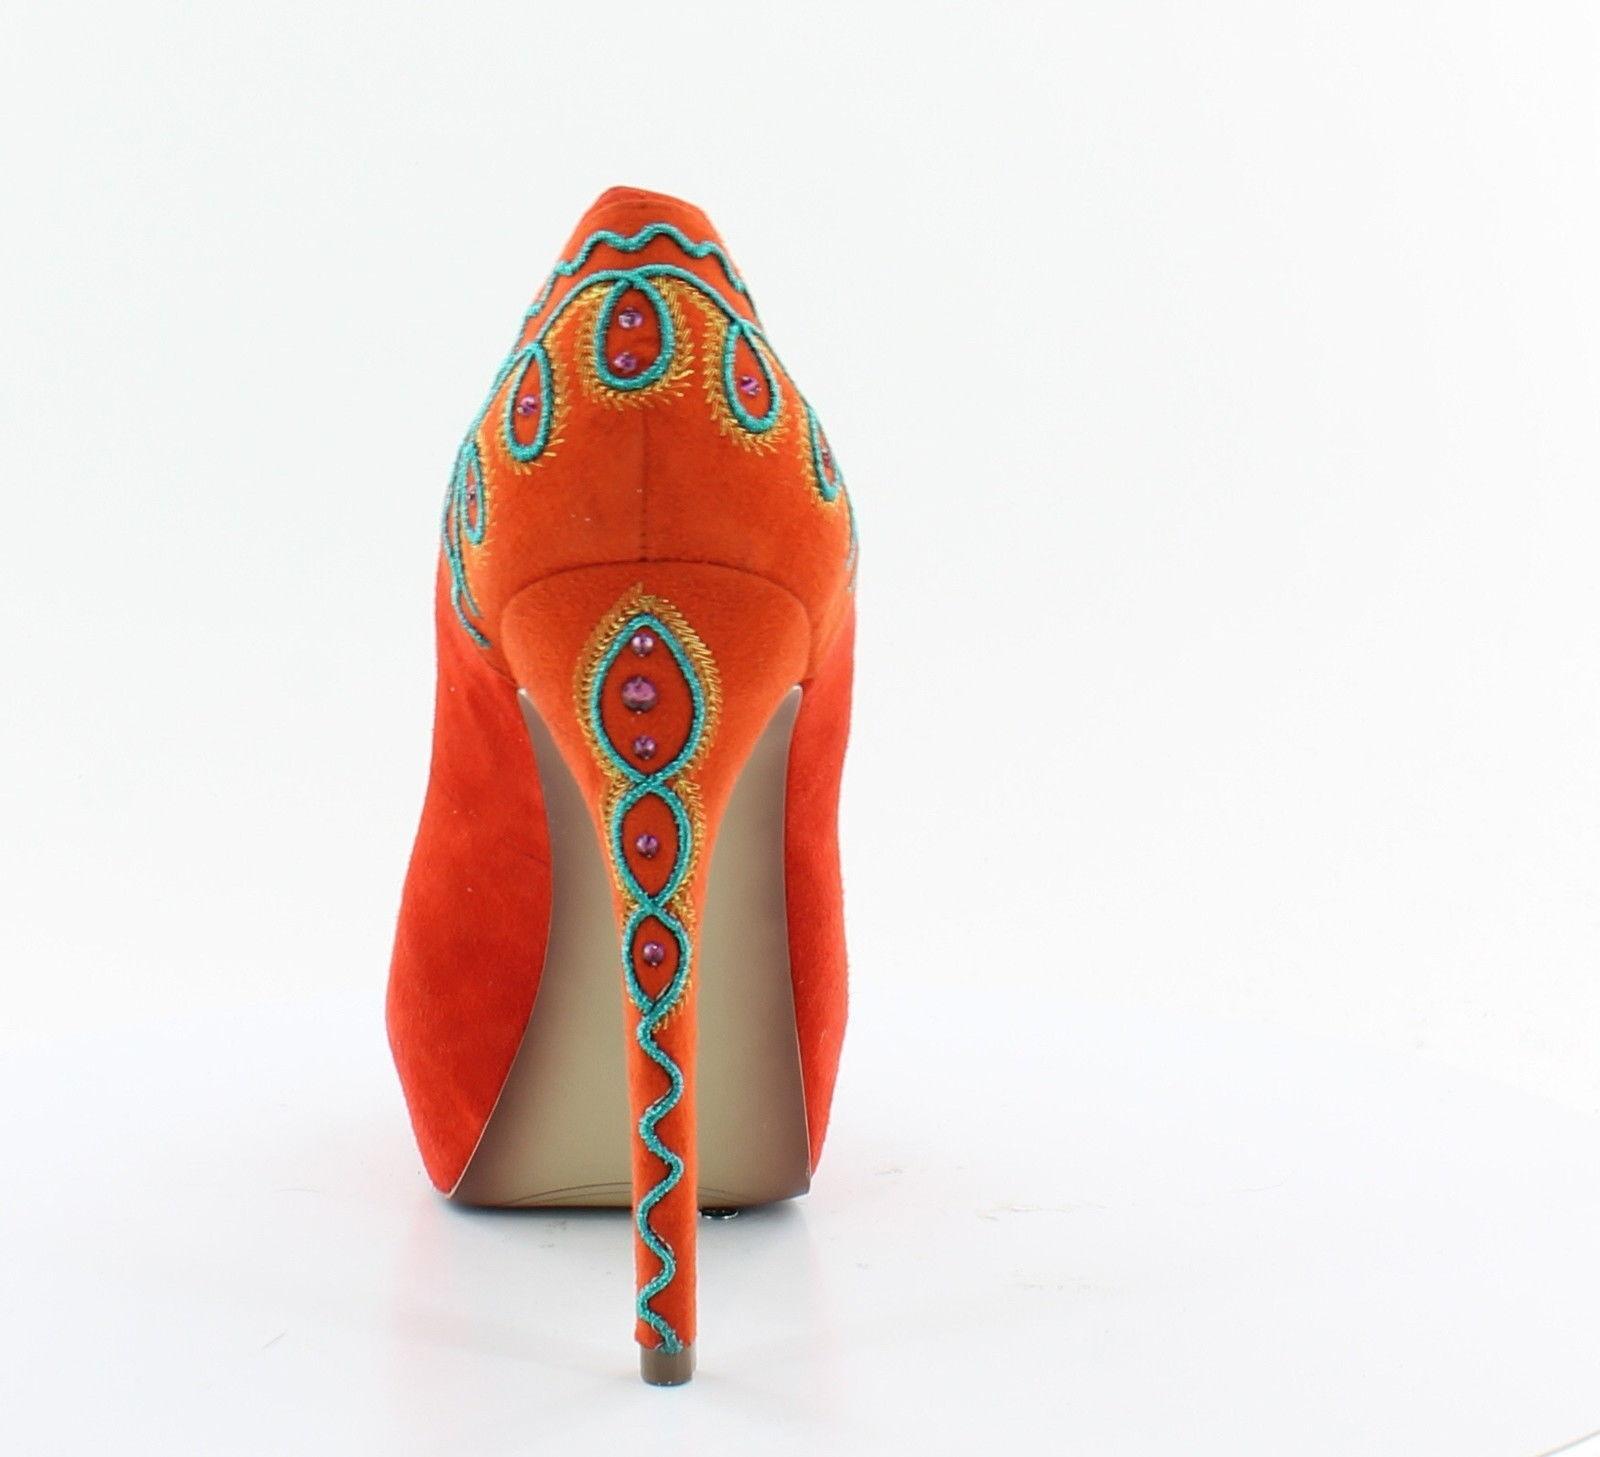 NIB Boutique 9 CHRYSO orange embroidered leather platform pumps heels shoes 7,5